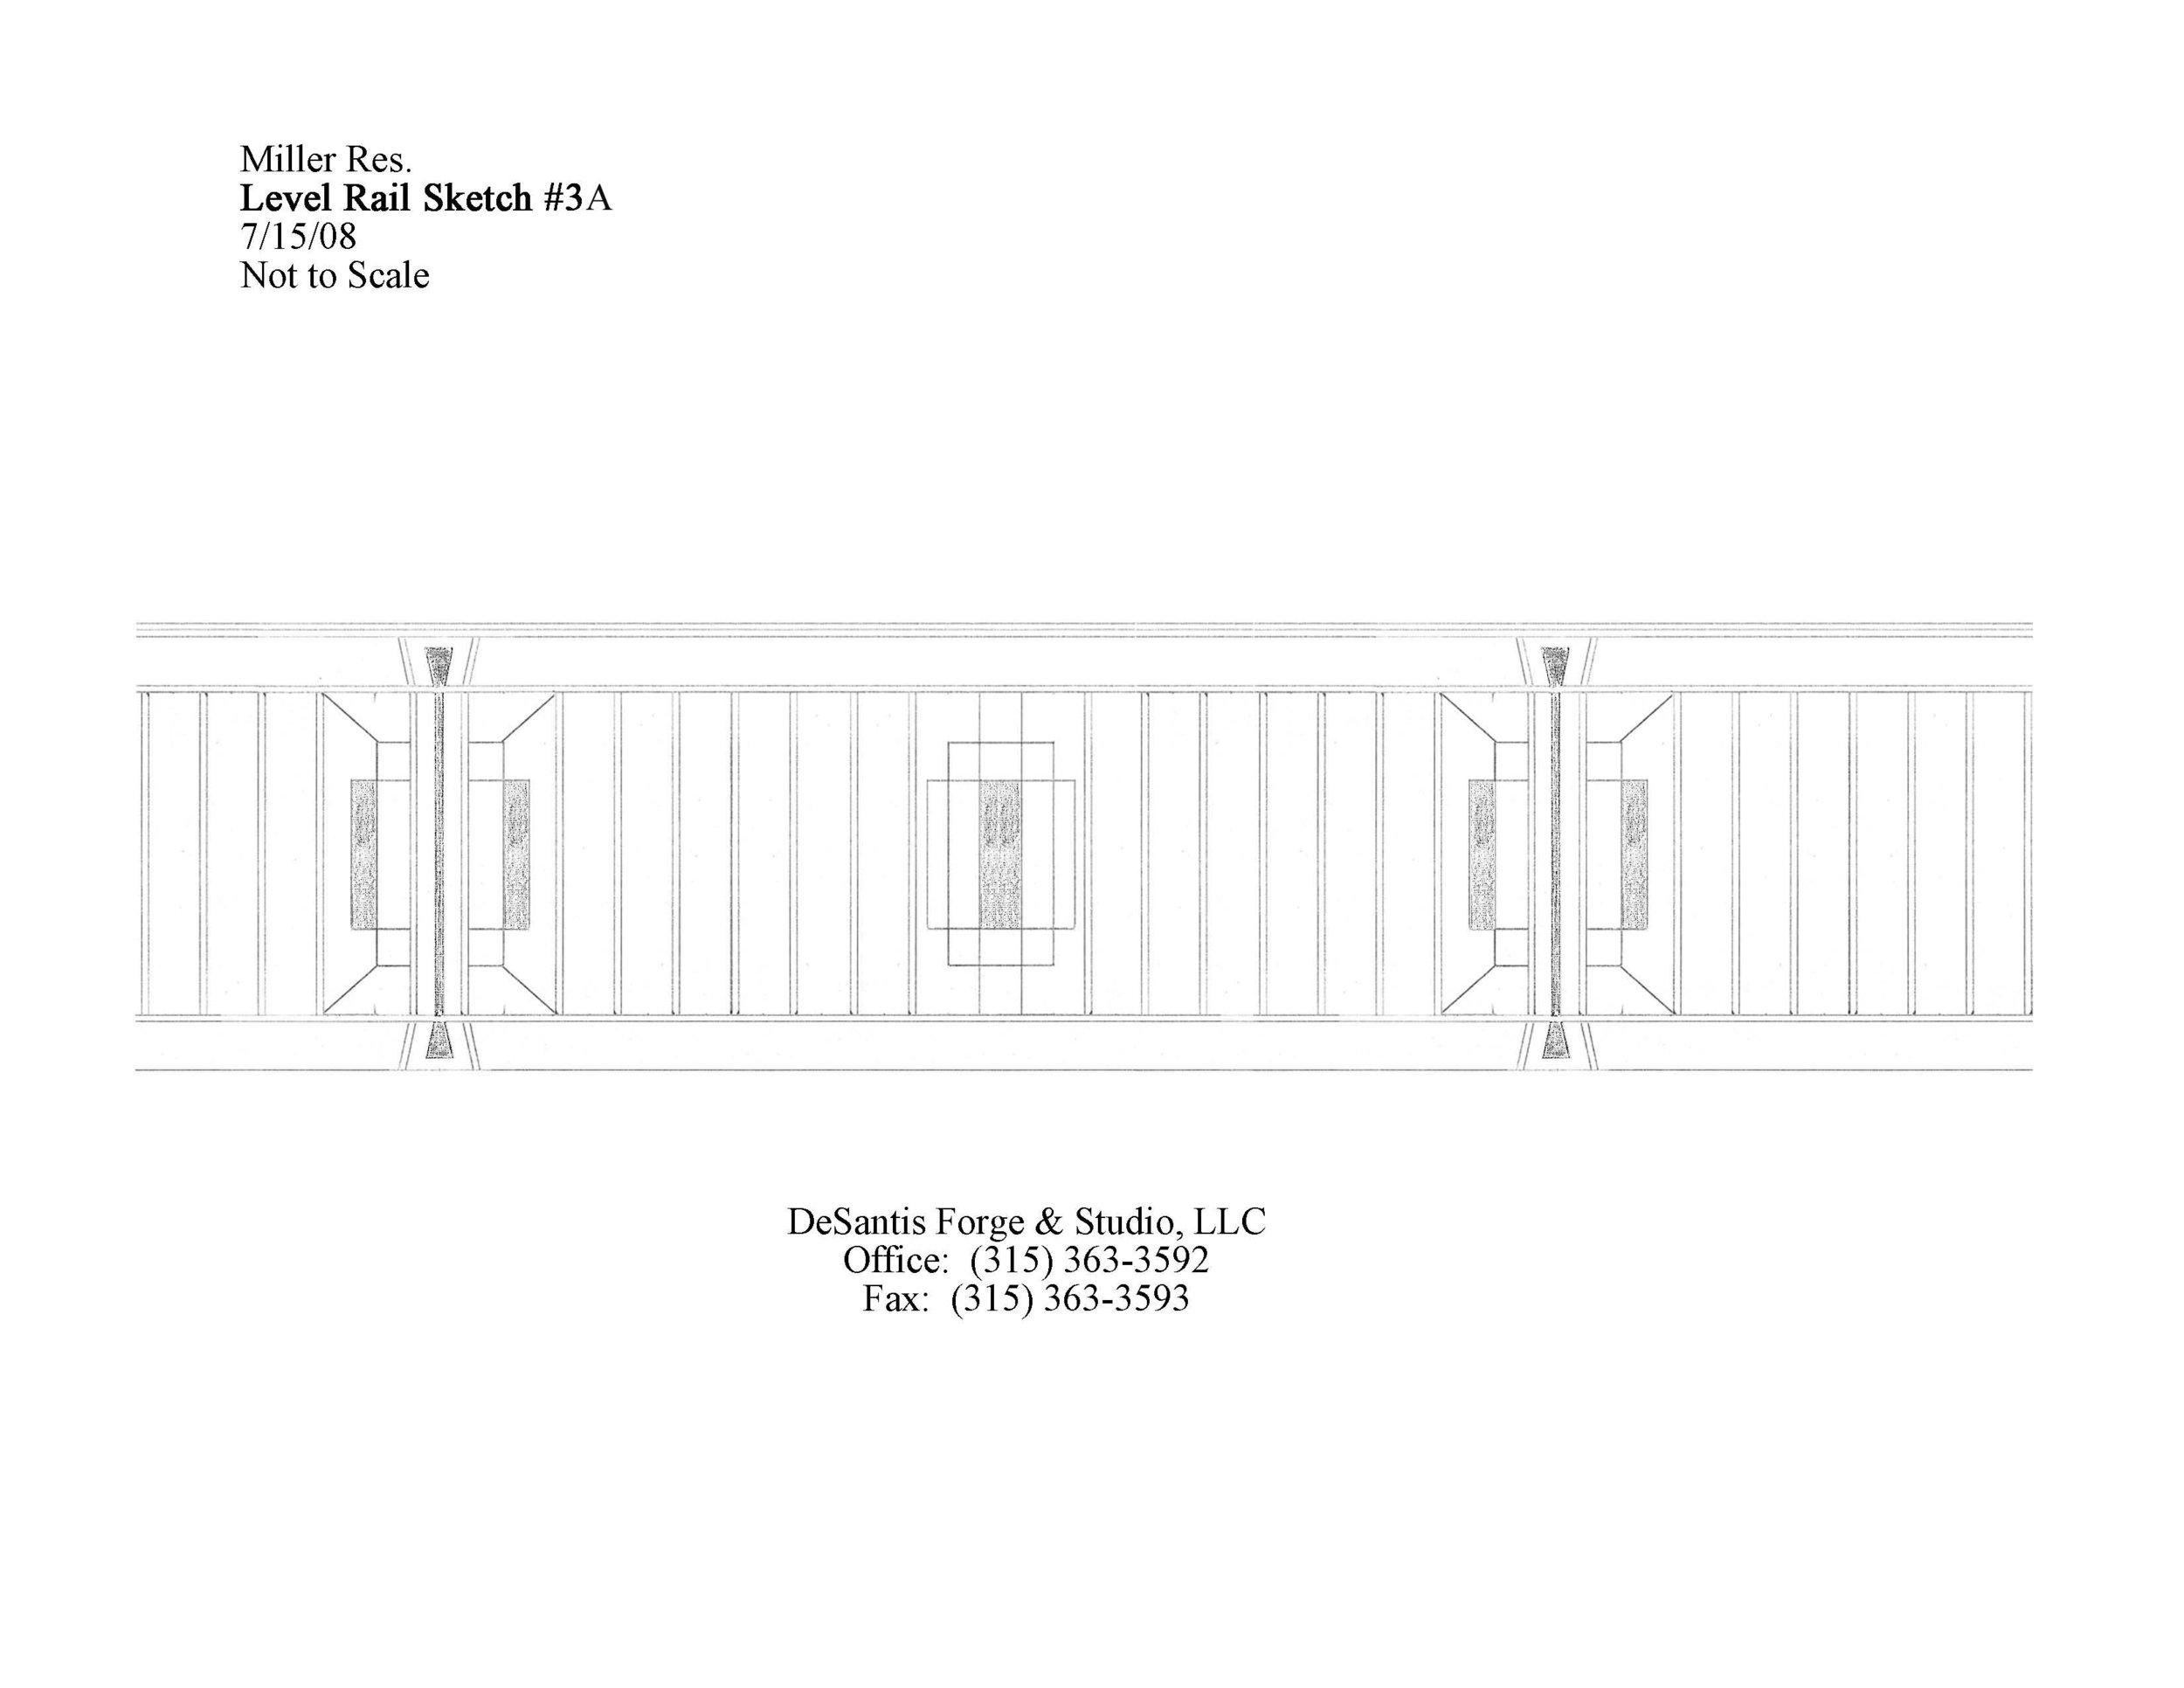 Level Rail Sketch #3A.jpg